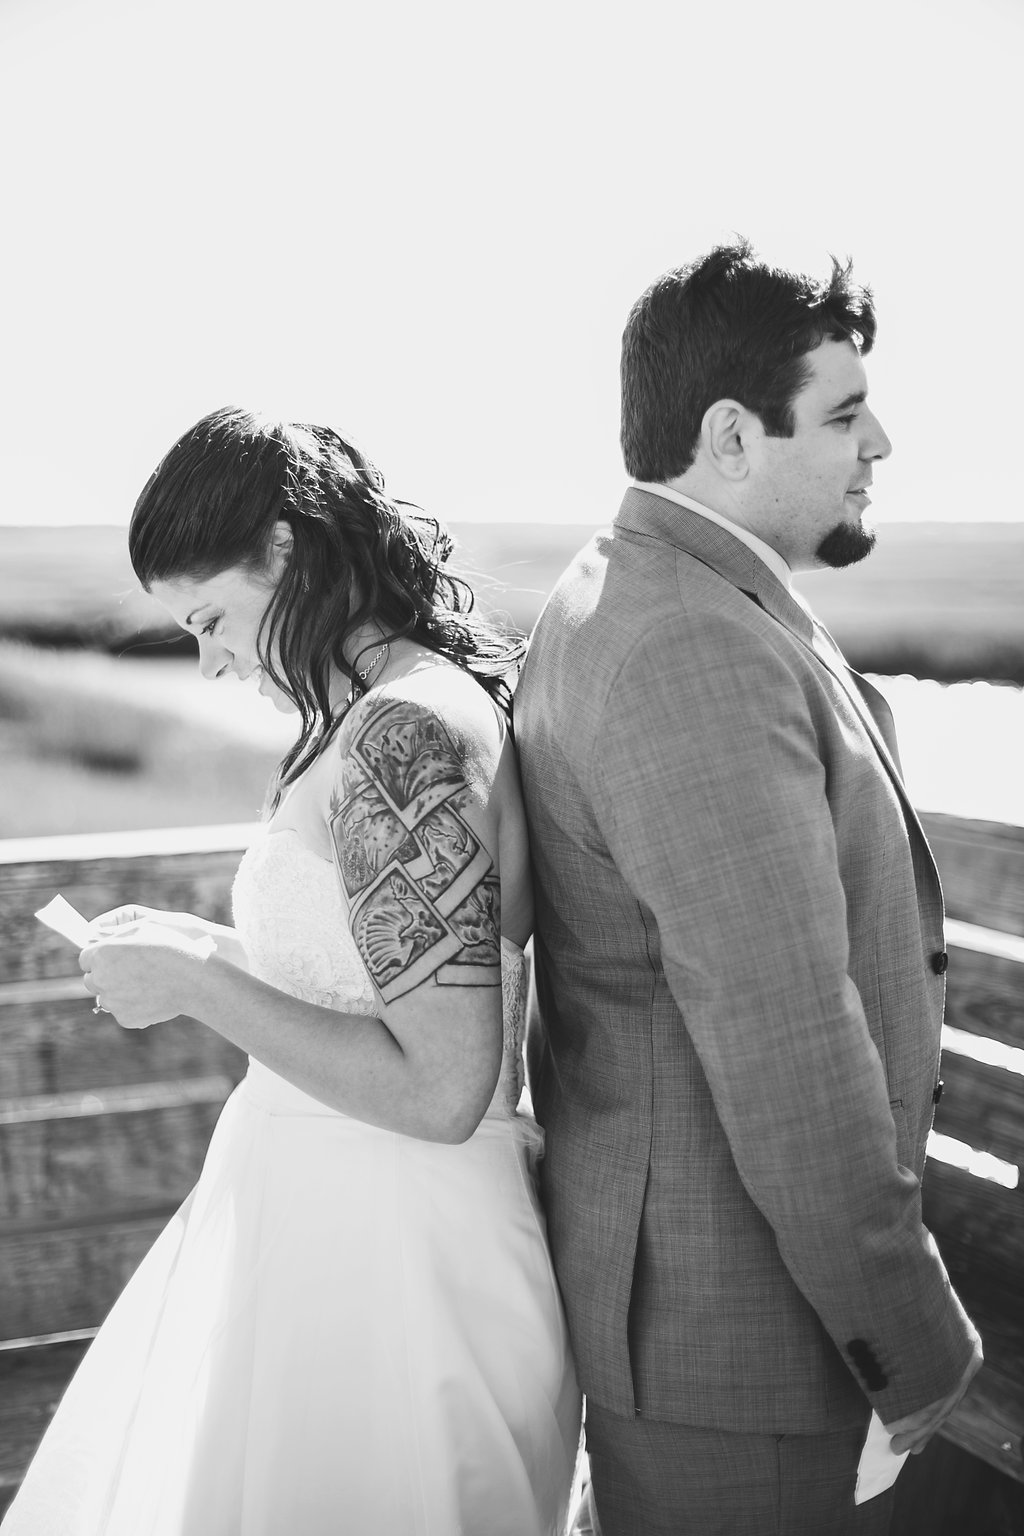 Laura + Matt Featured DIY Wedding // The Overwhelmed Bride Bridal Lifestyle + Wedding Blog // Wedding Vows